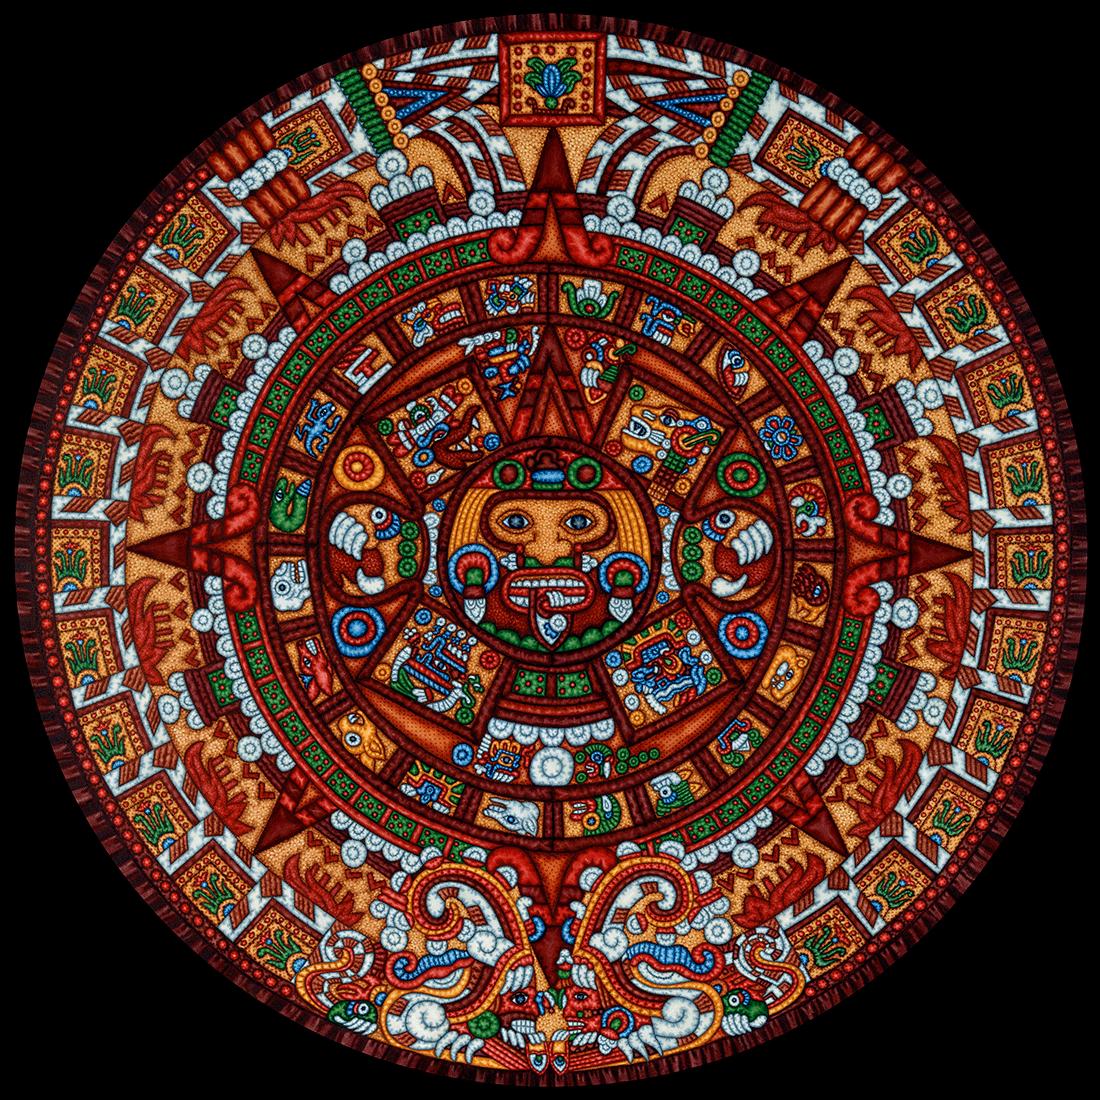 Aztec Calendar Base Image